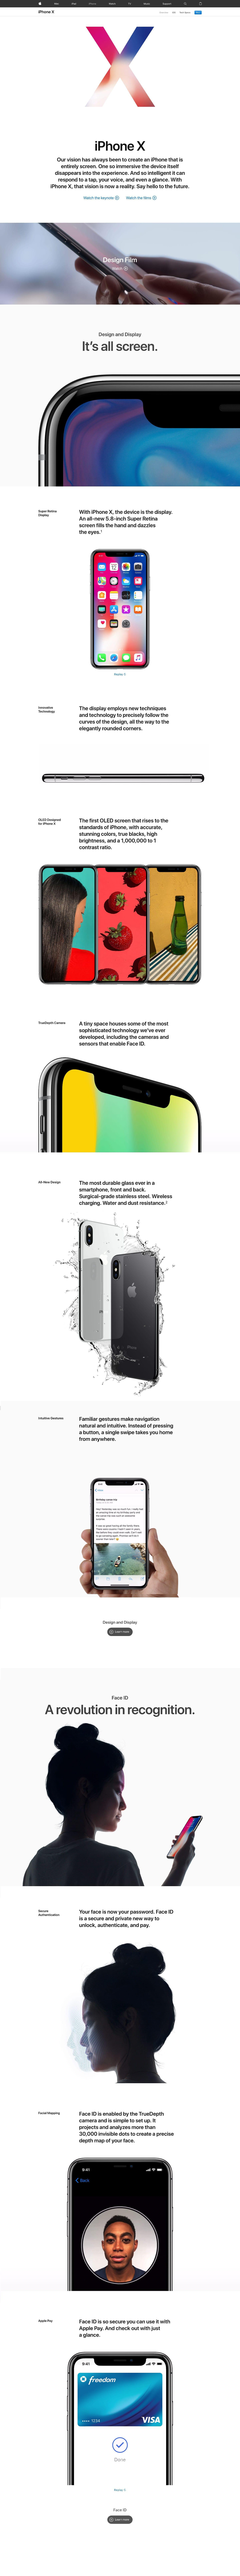 screencapture-apple-iphone-x-2018-07-08-21_33_46 copy